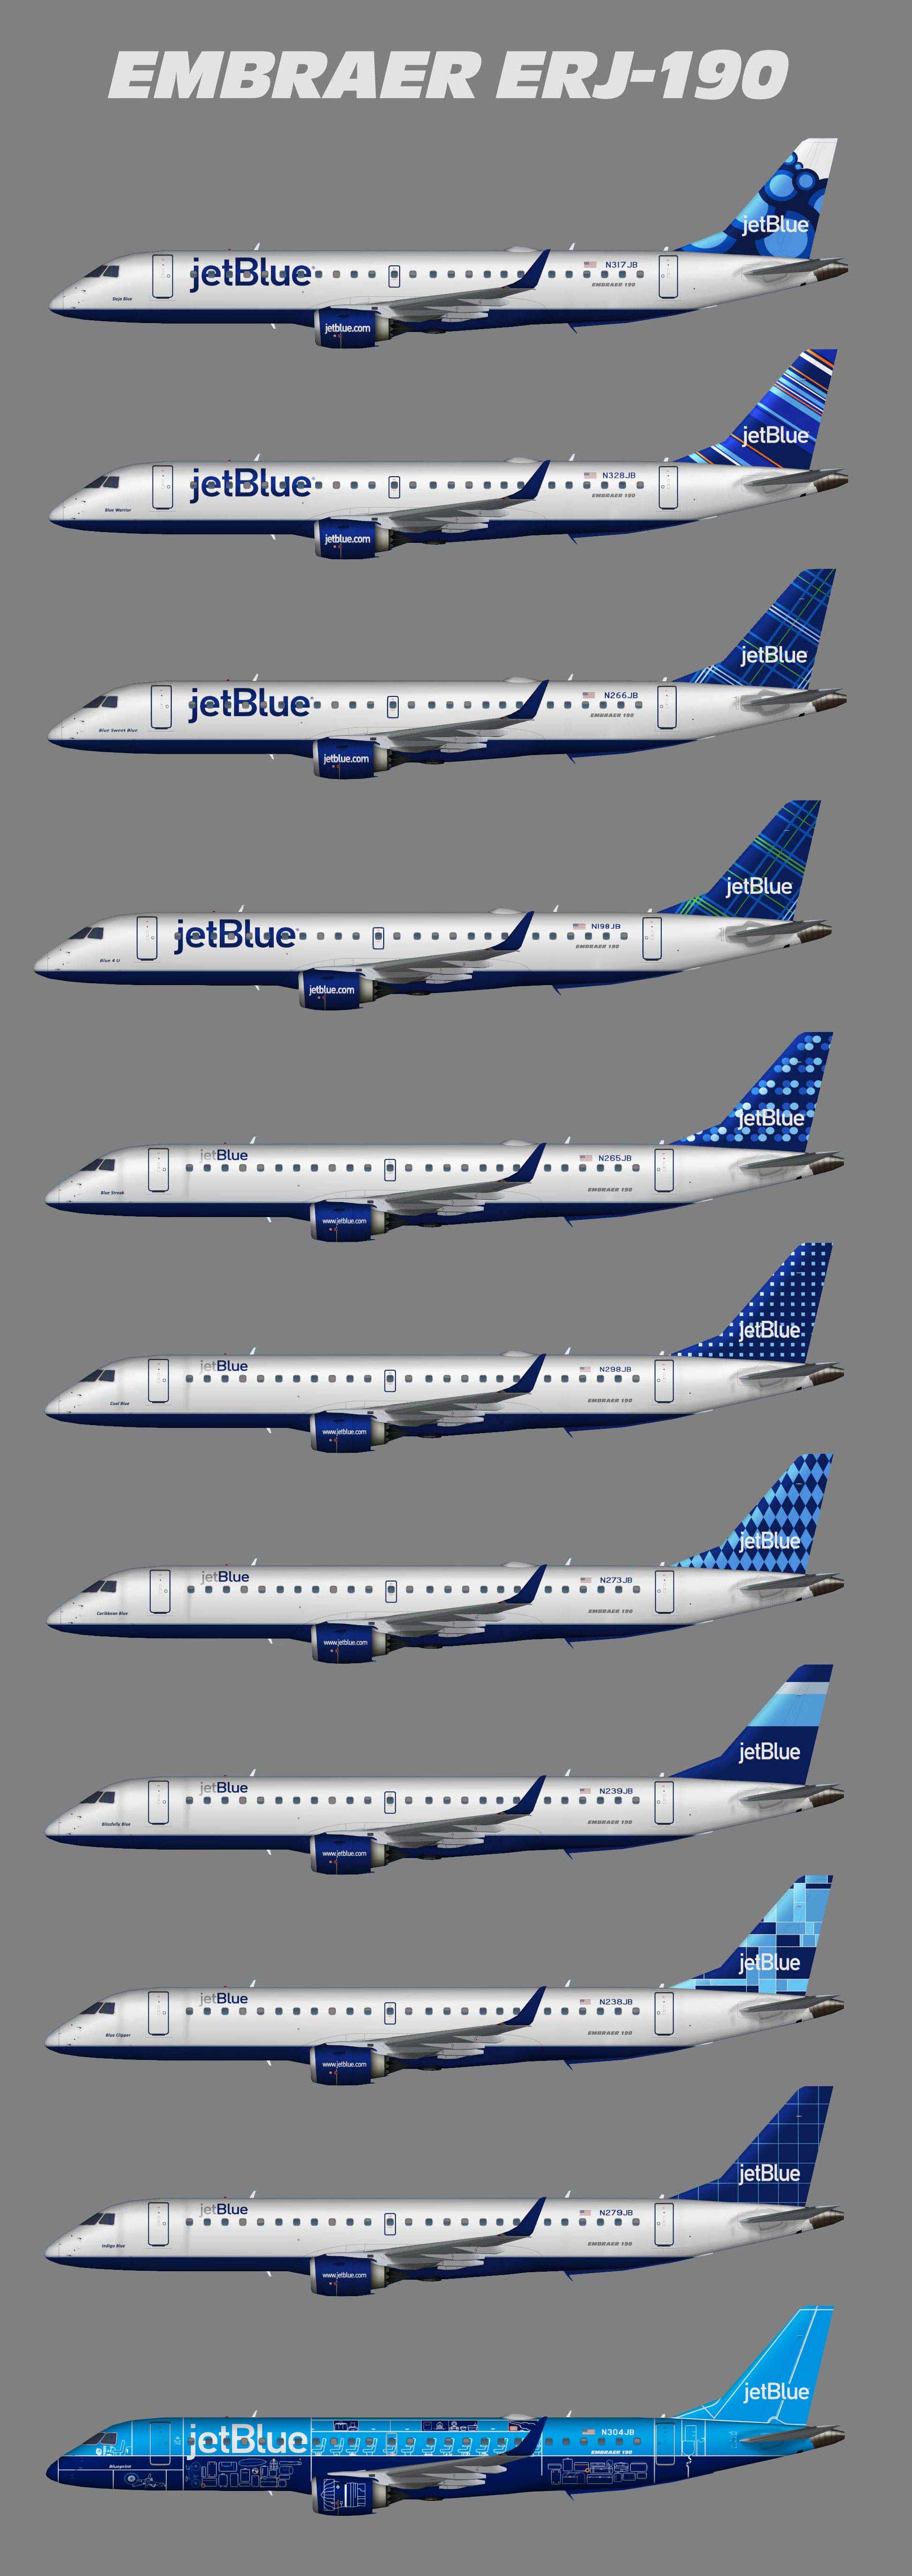 JetBlue Embraer ERJ-190-100